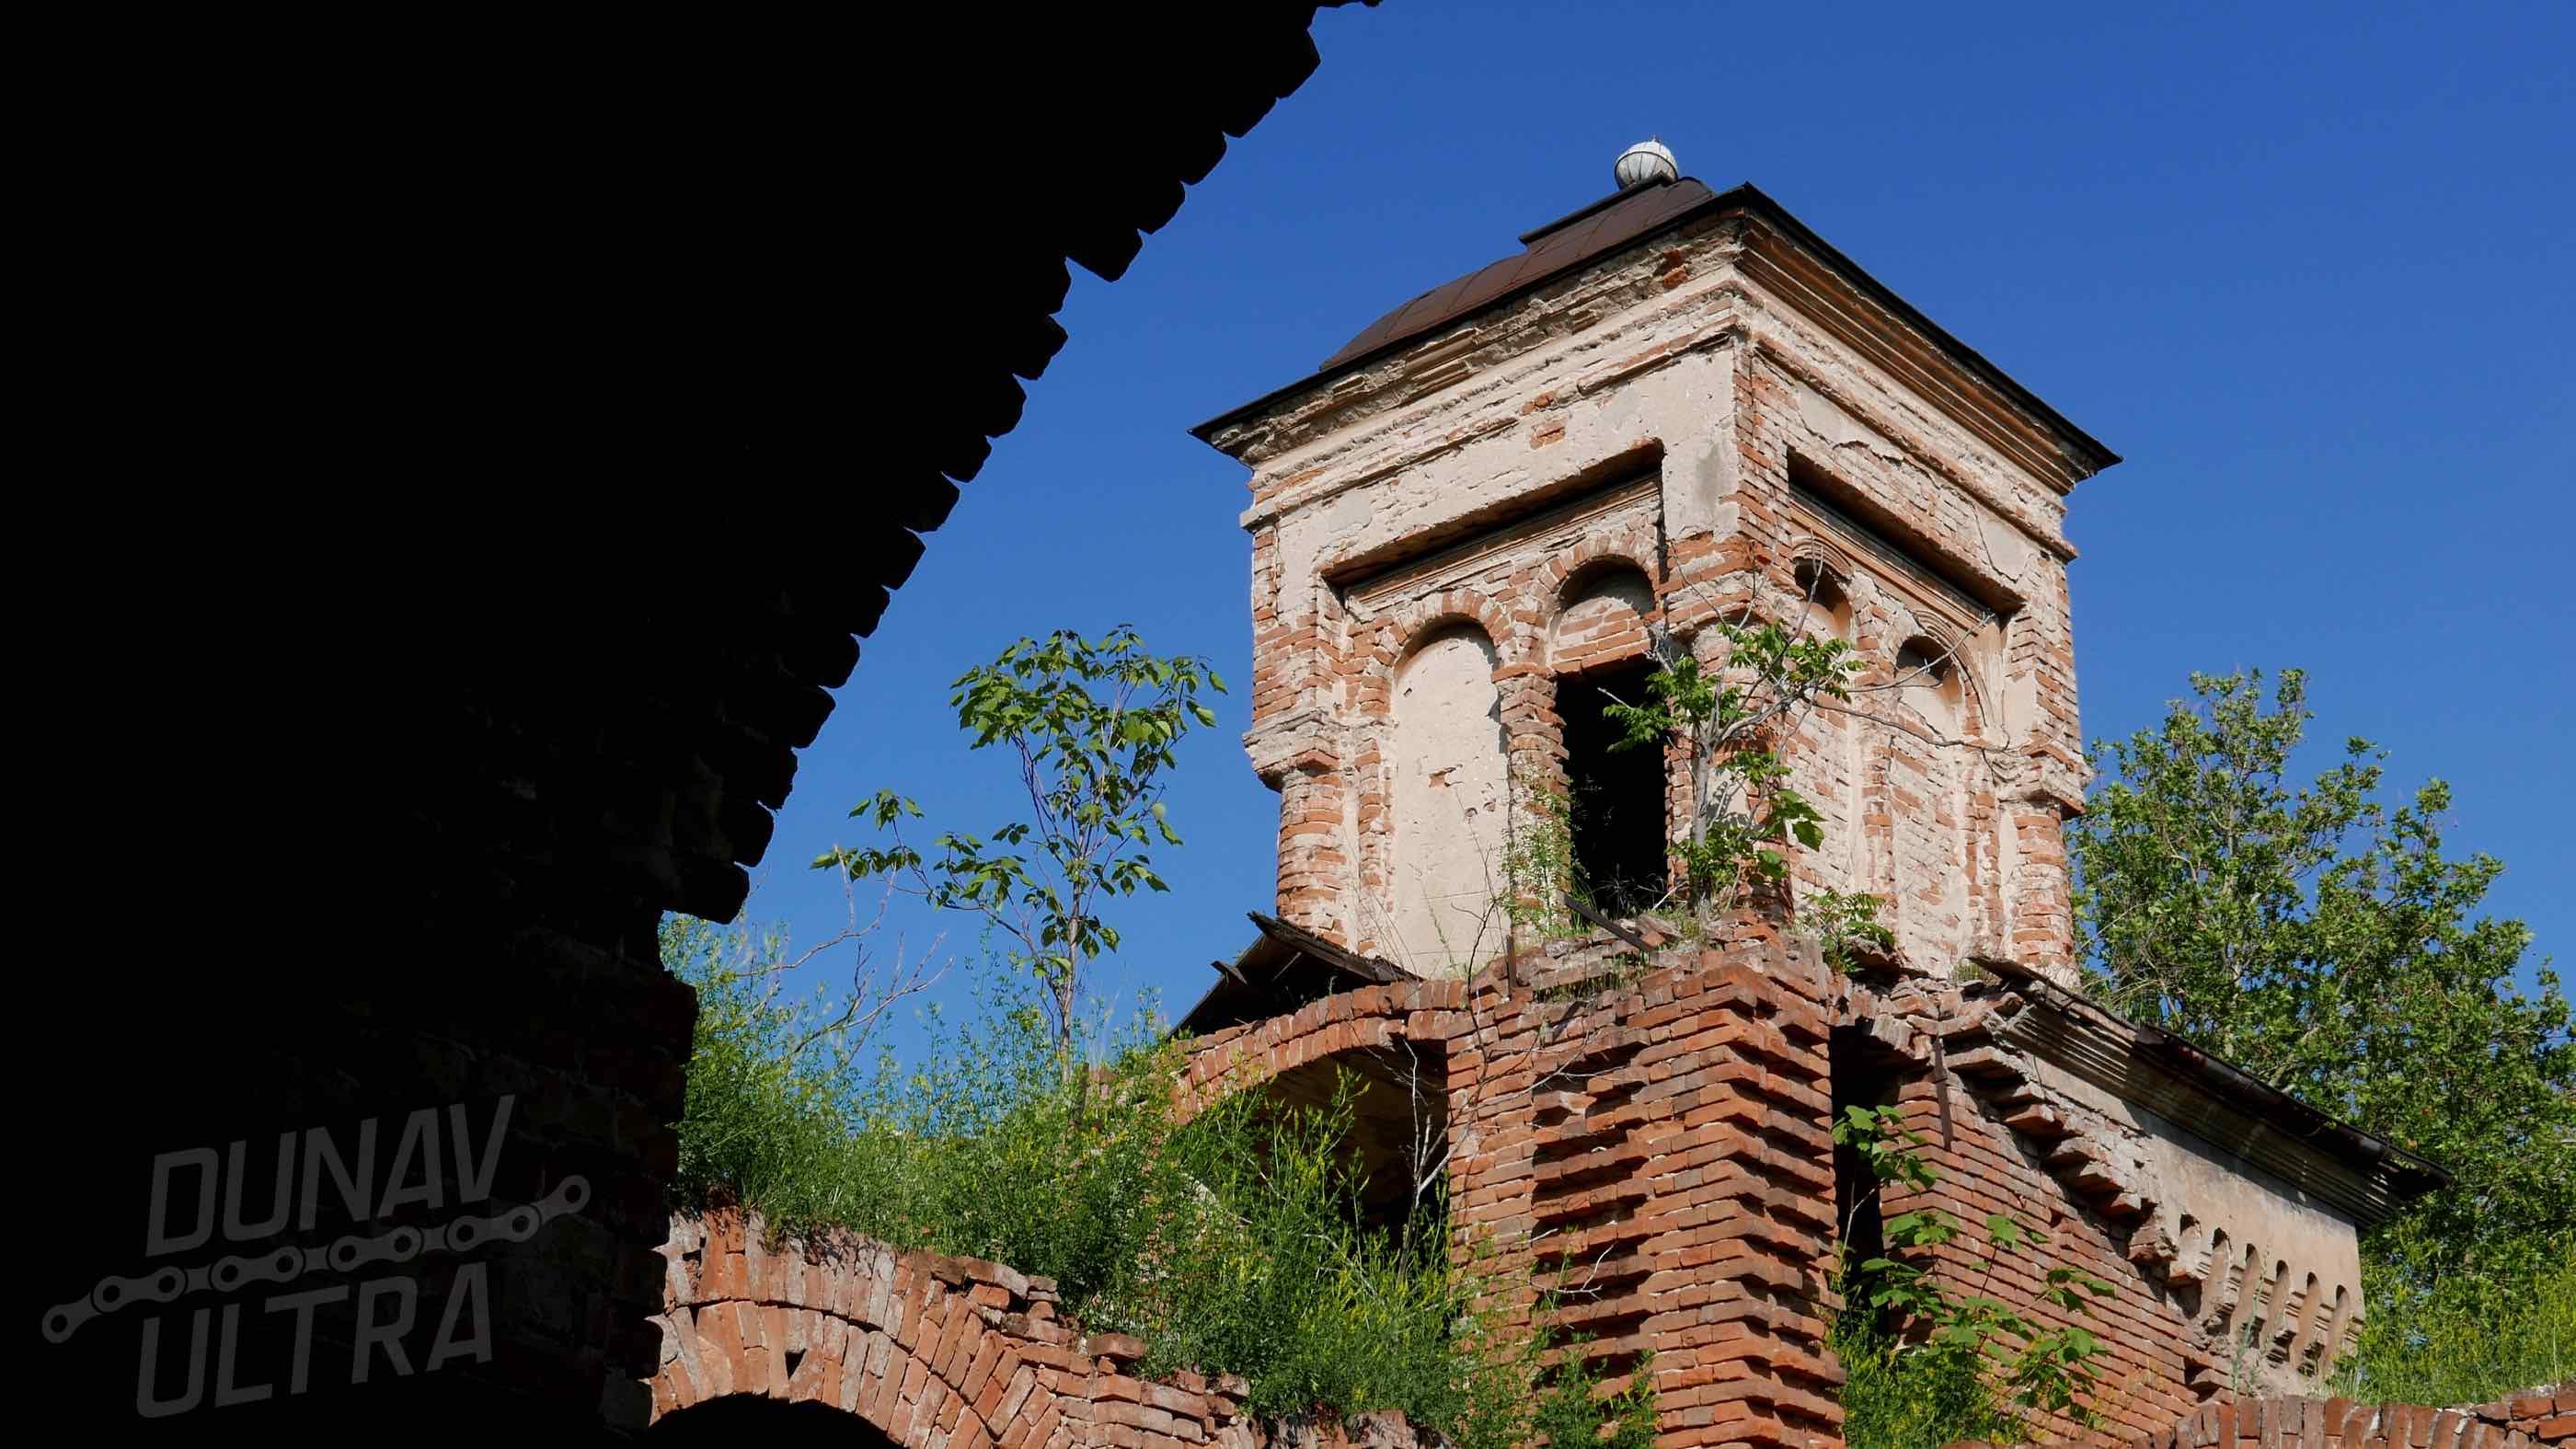 Dunav Ultra 101: The Synagogue of Vidin